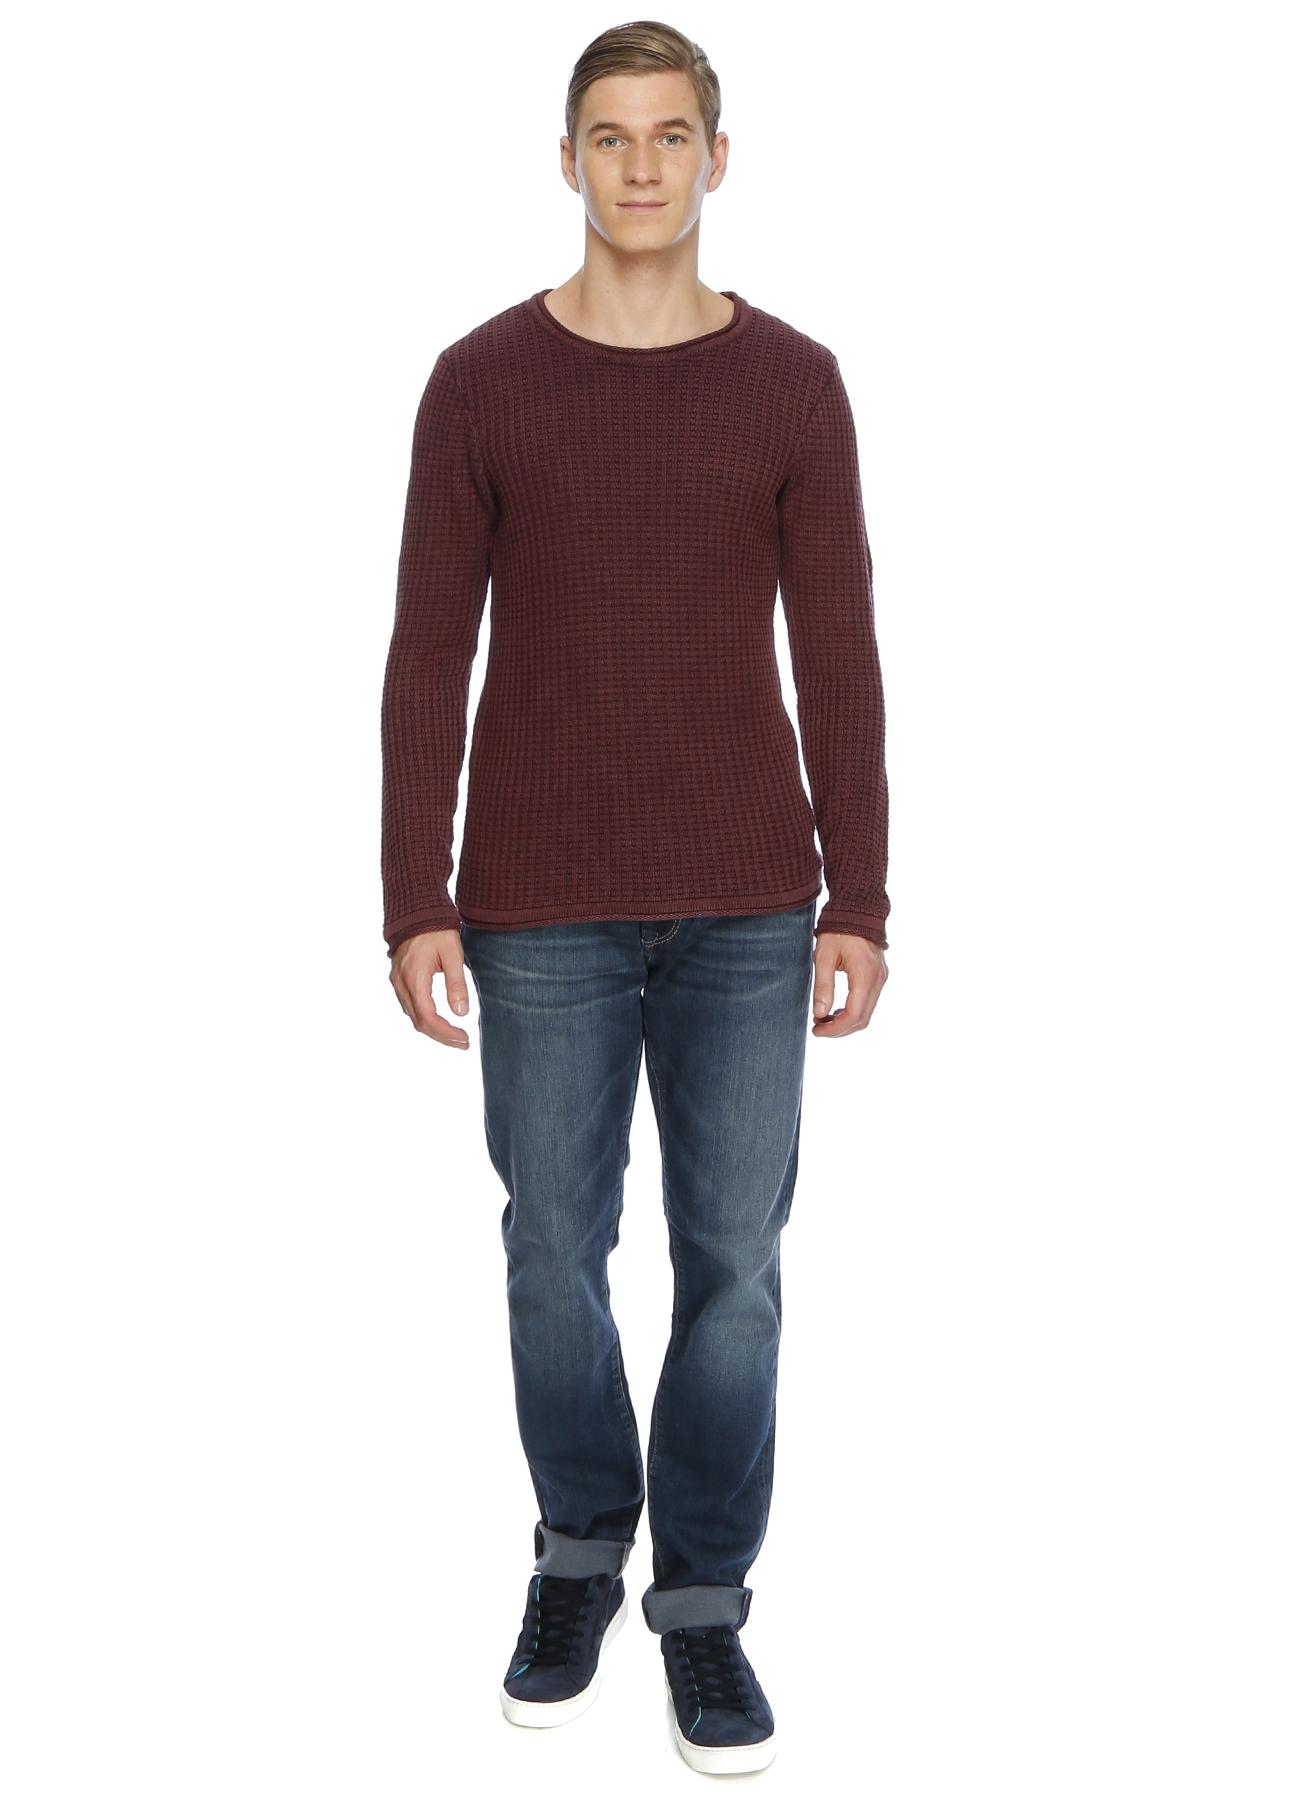 Mavi Marcus Vintage Klasik Pantolon 33-32 5000162865020 Ürün Resmi